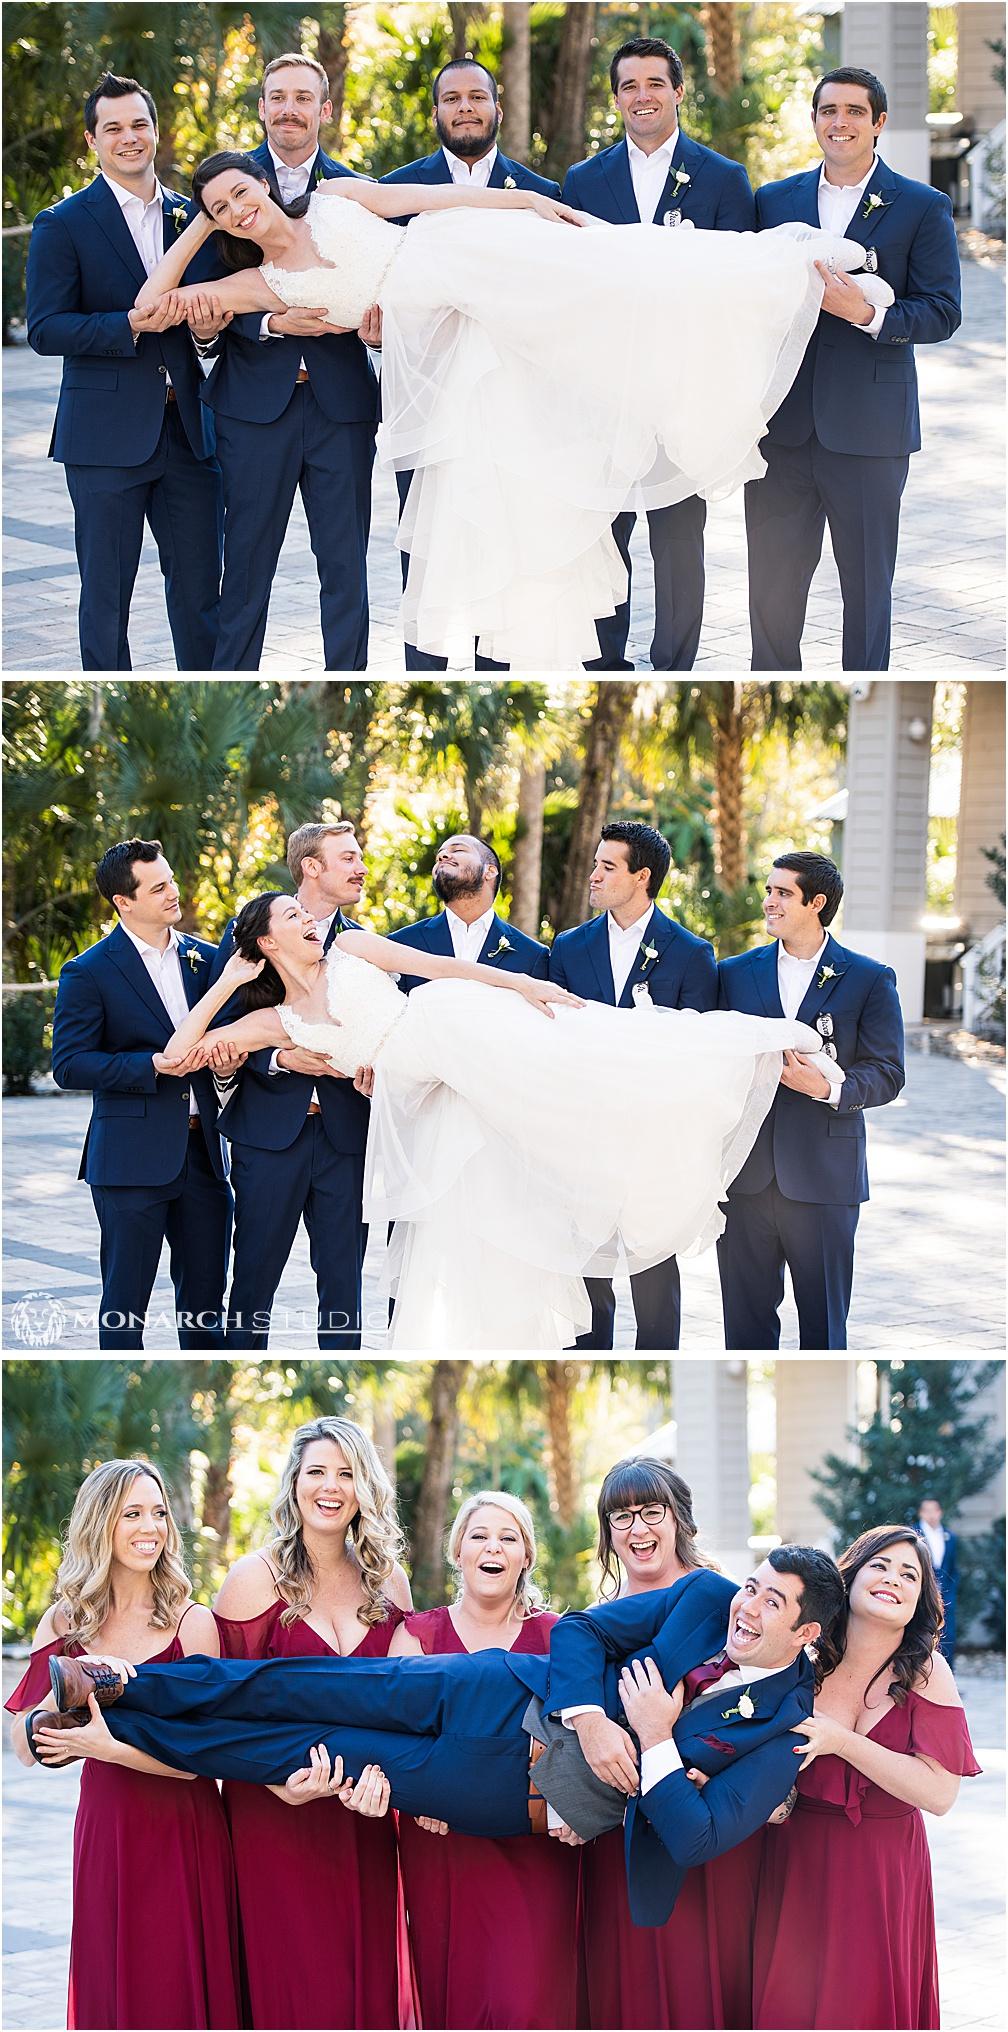 Wedding-photographer-in-sanford-florida-natural-wedding-023.jpg